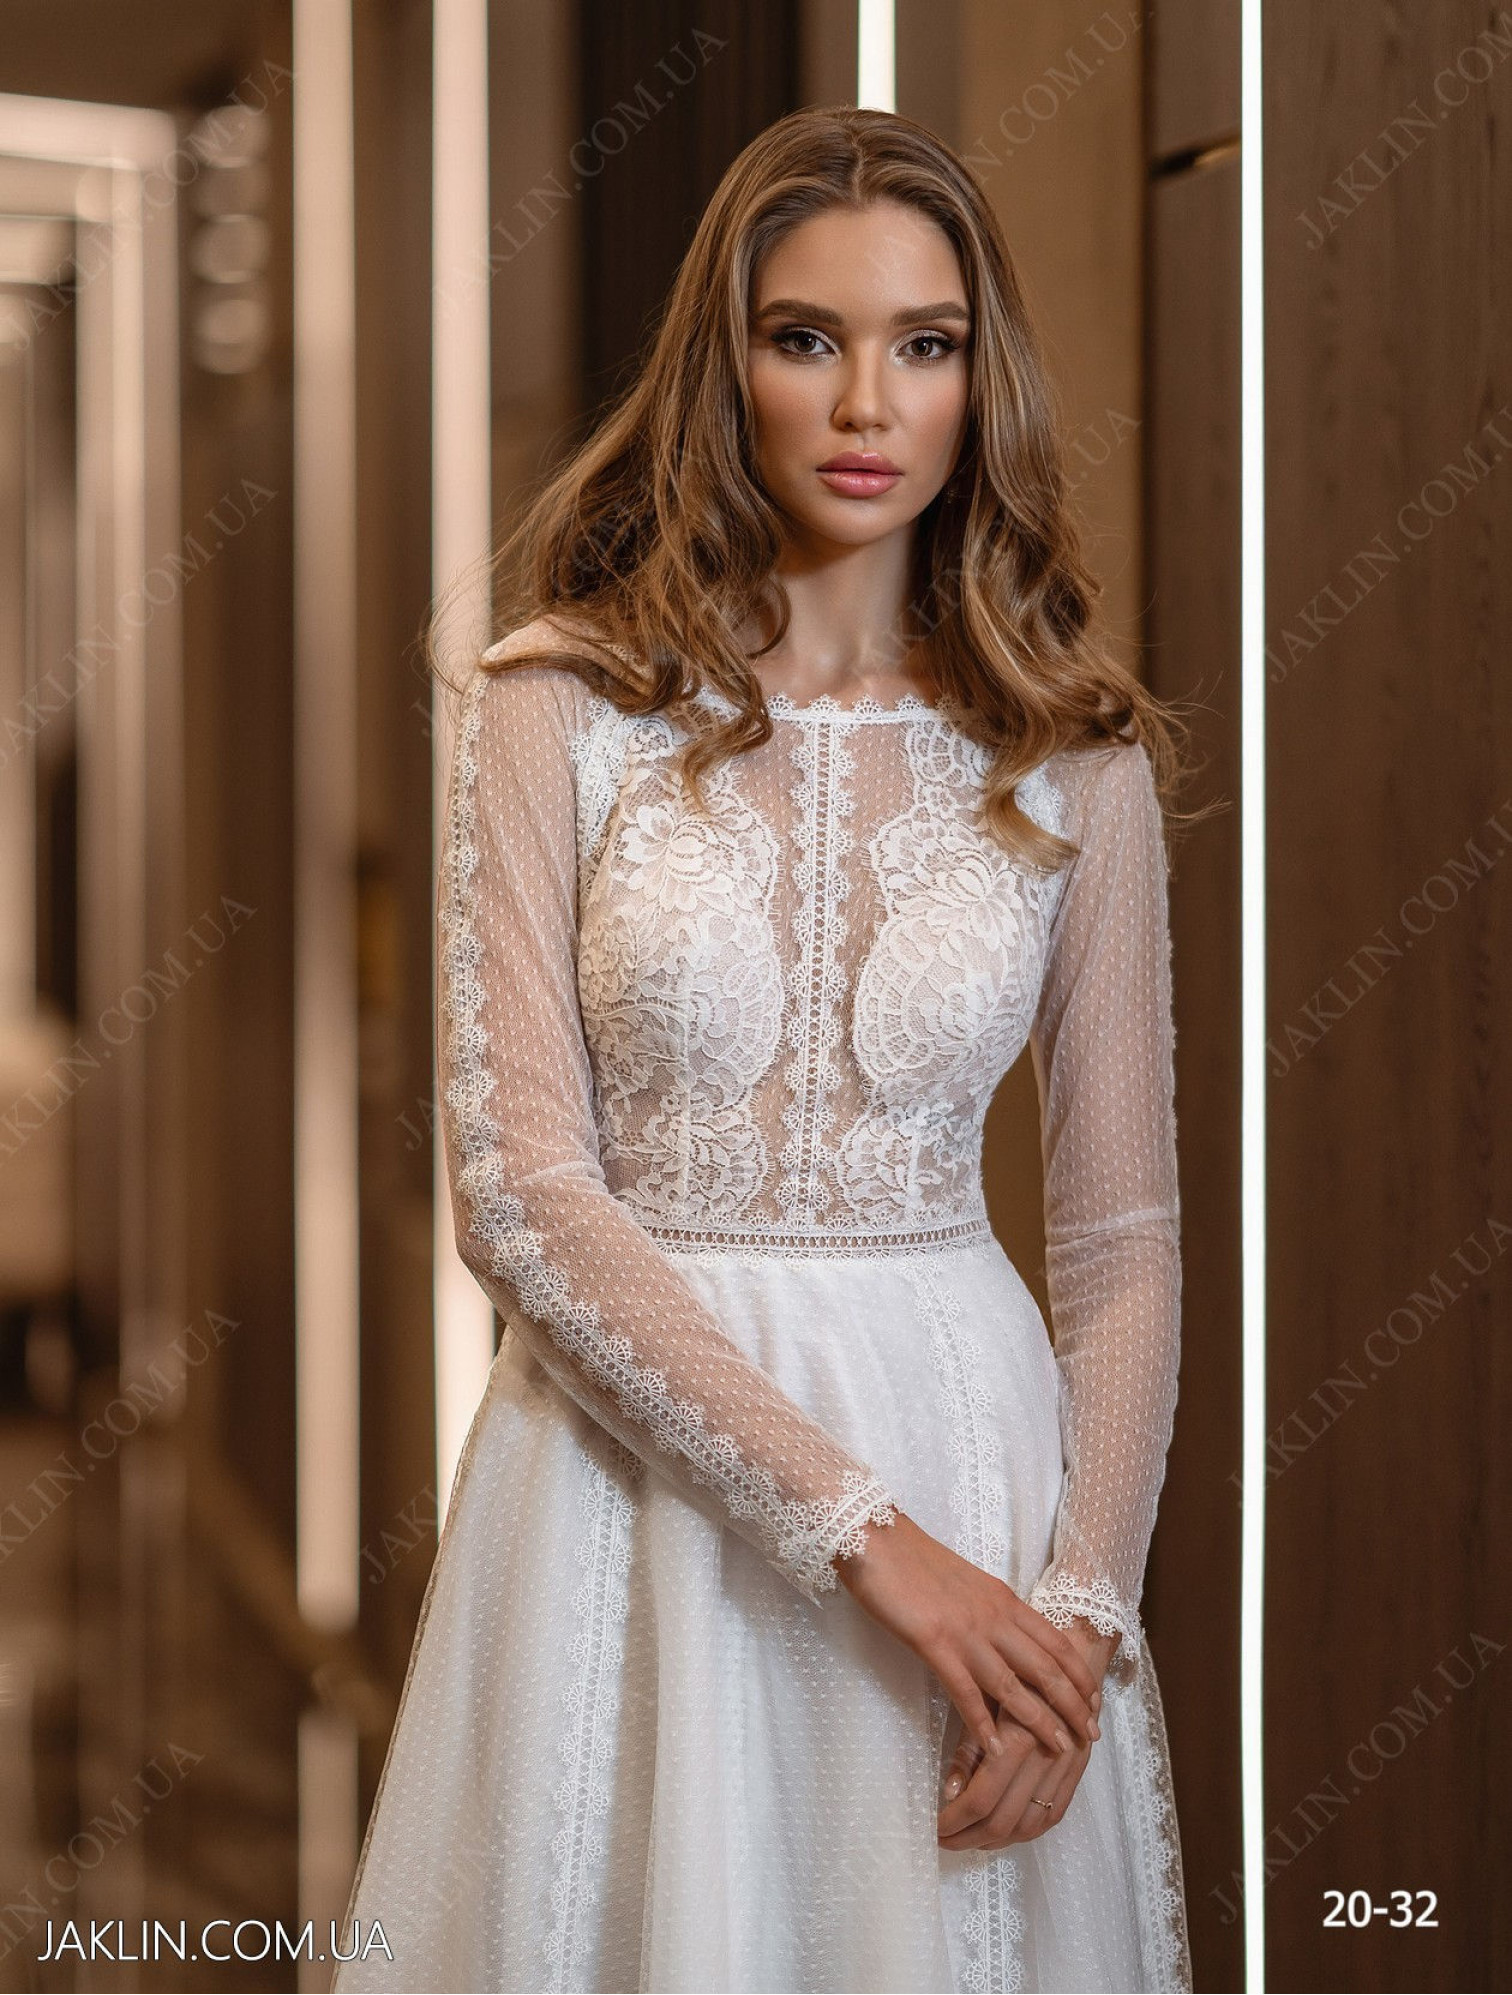 Wedding dress 20-32